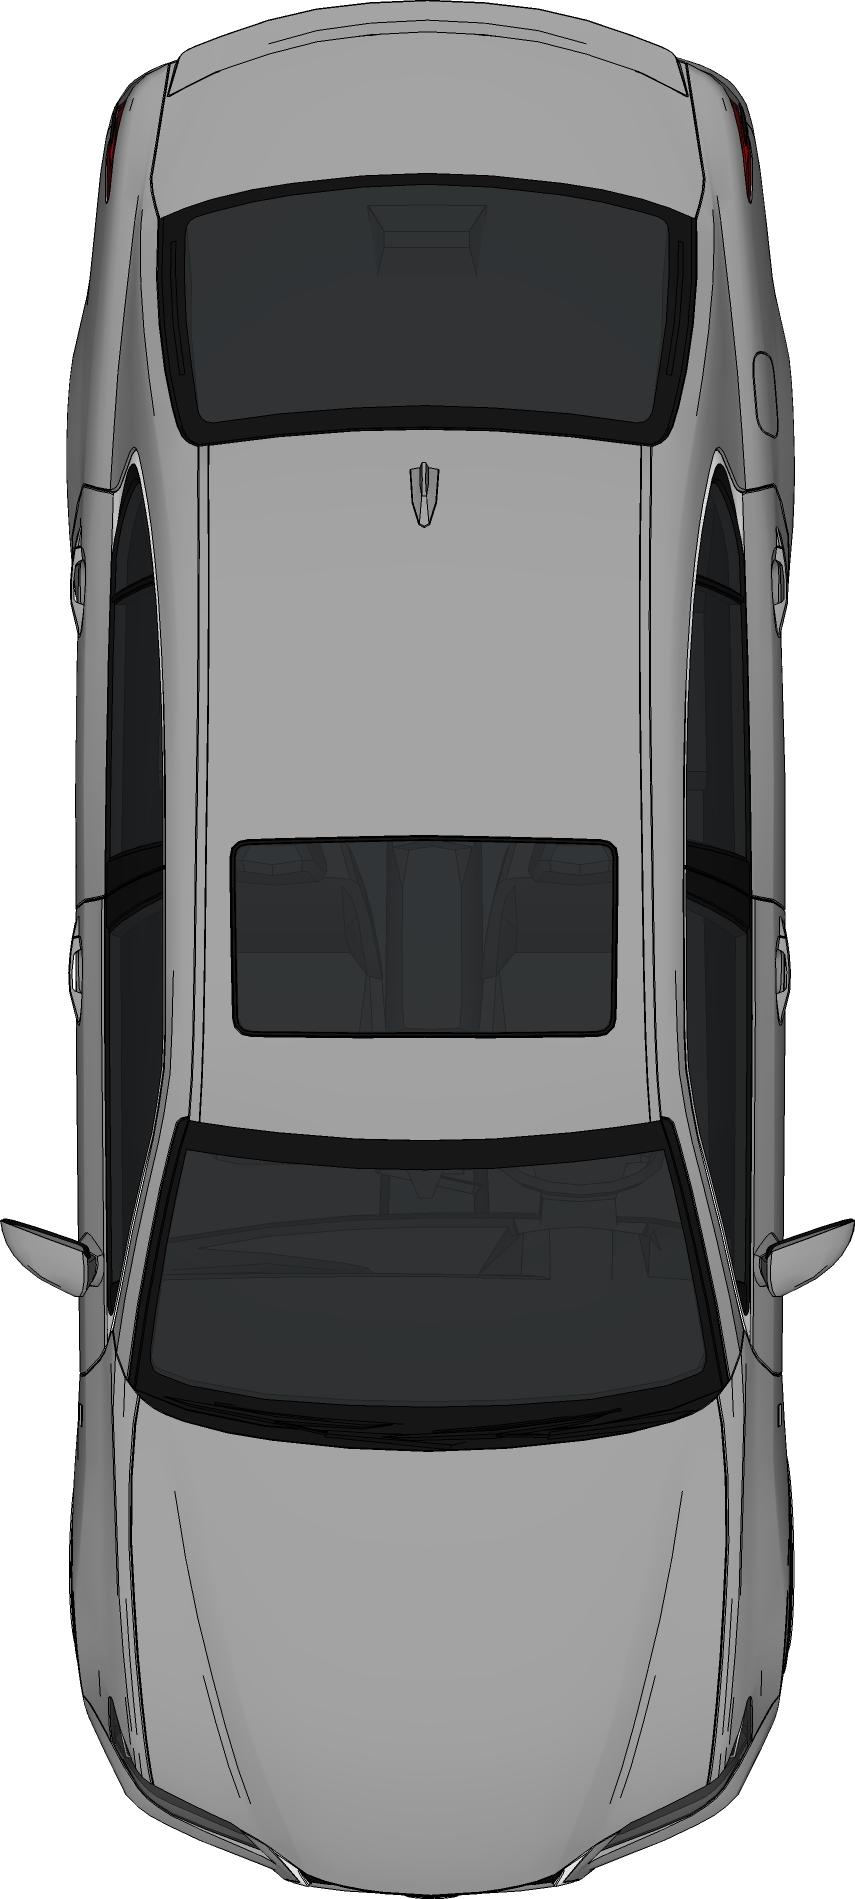 library Car Clip art